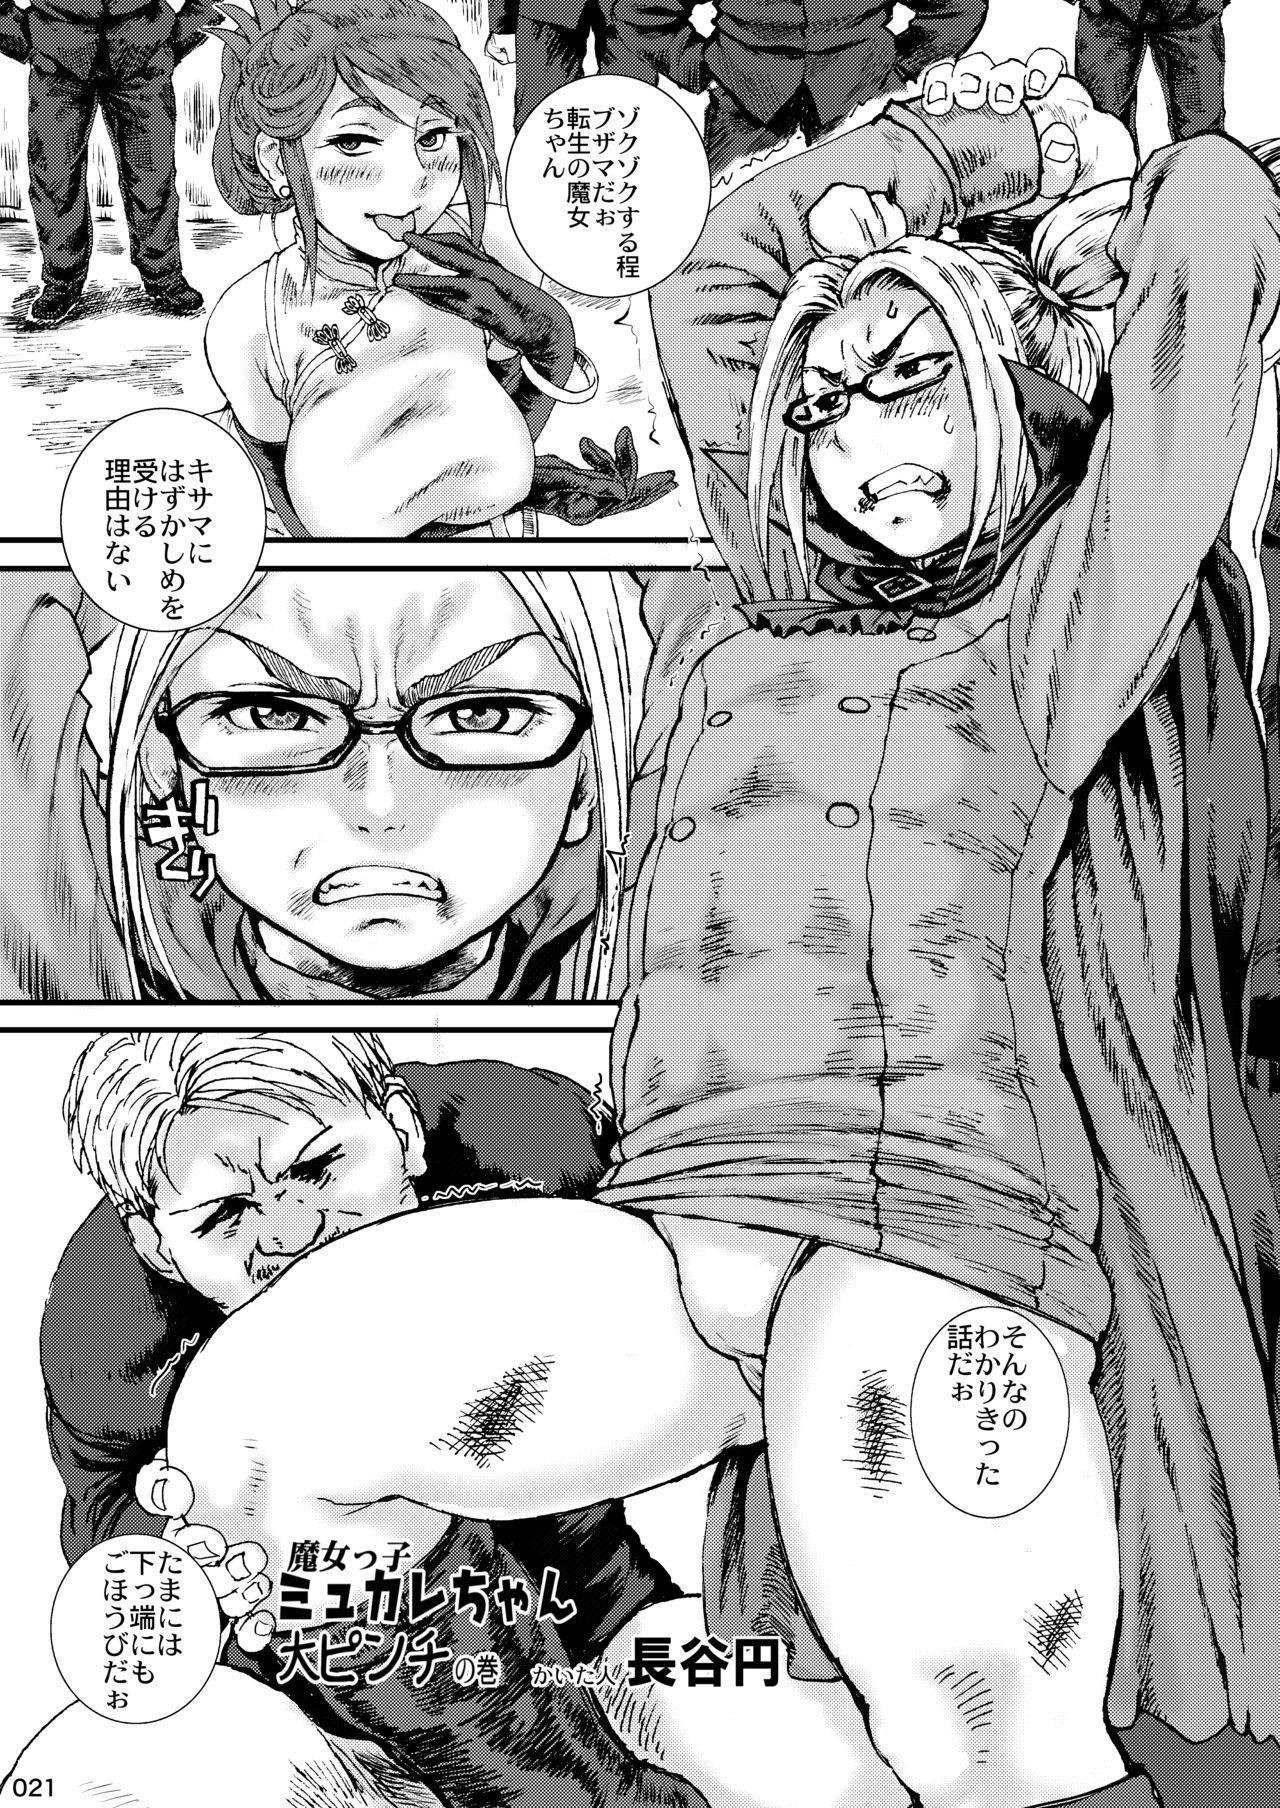 Akatsuki Blitzkampf & EN-1 Perfekt Welt Gangbang Anthology 20